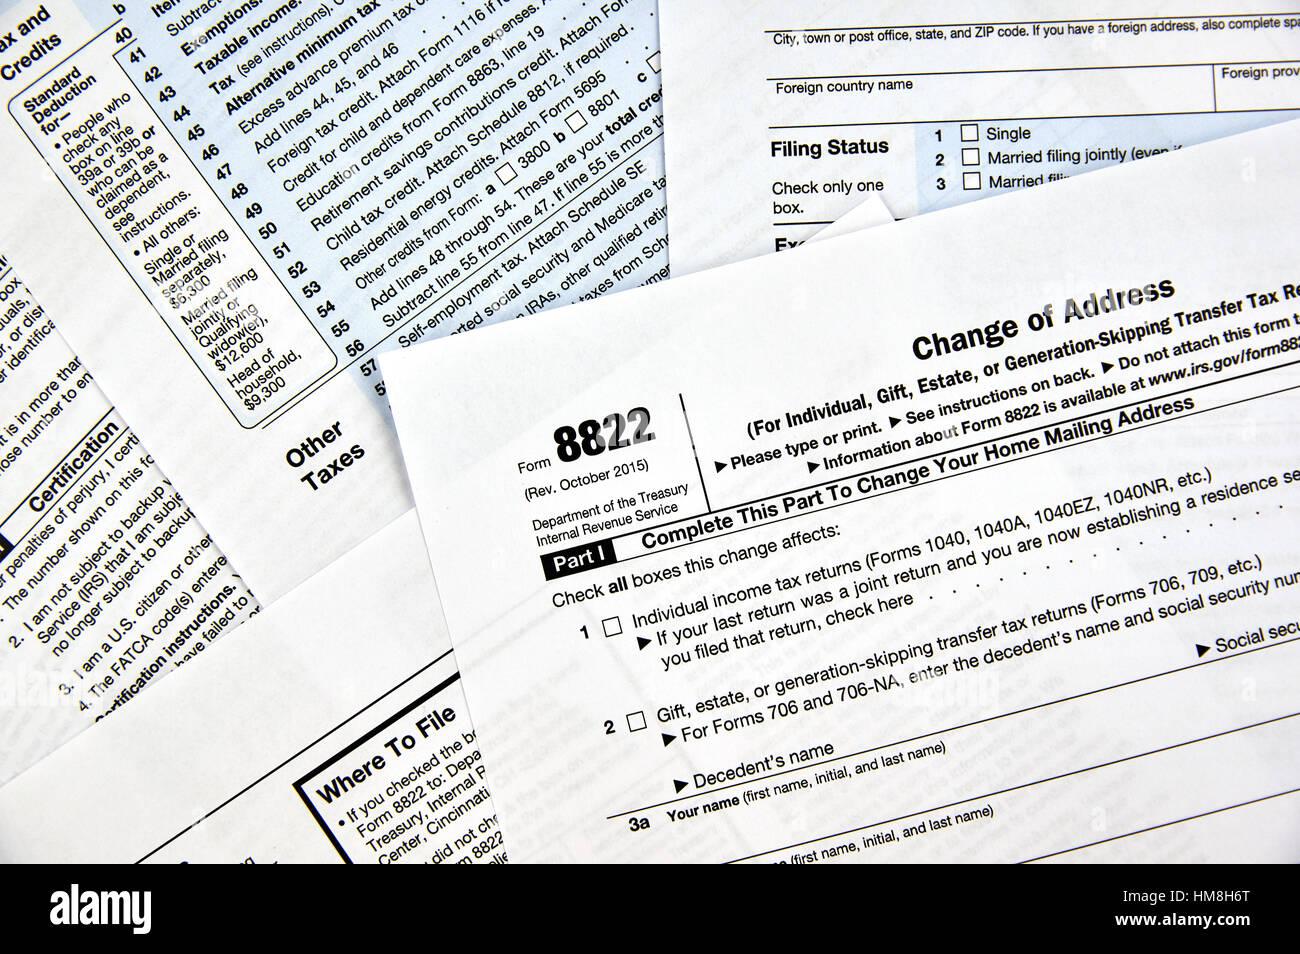 8822 Change Of Address Federal Tax Form Stock Photo 132954832 Alamy